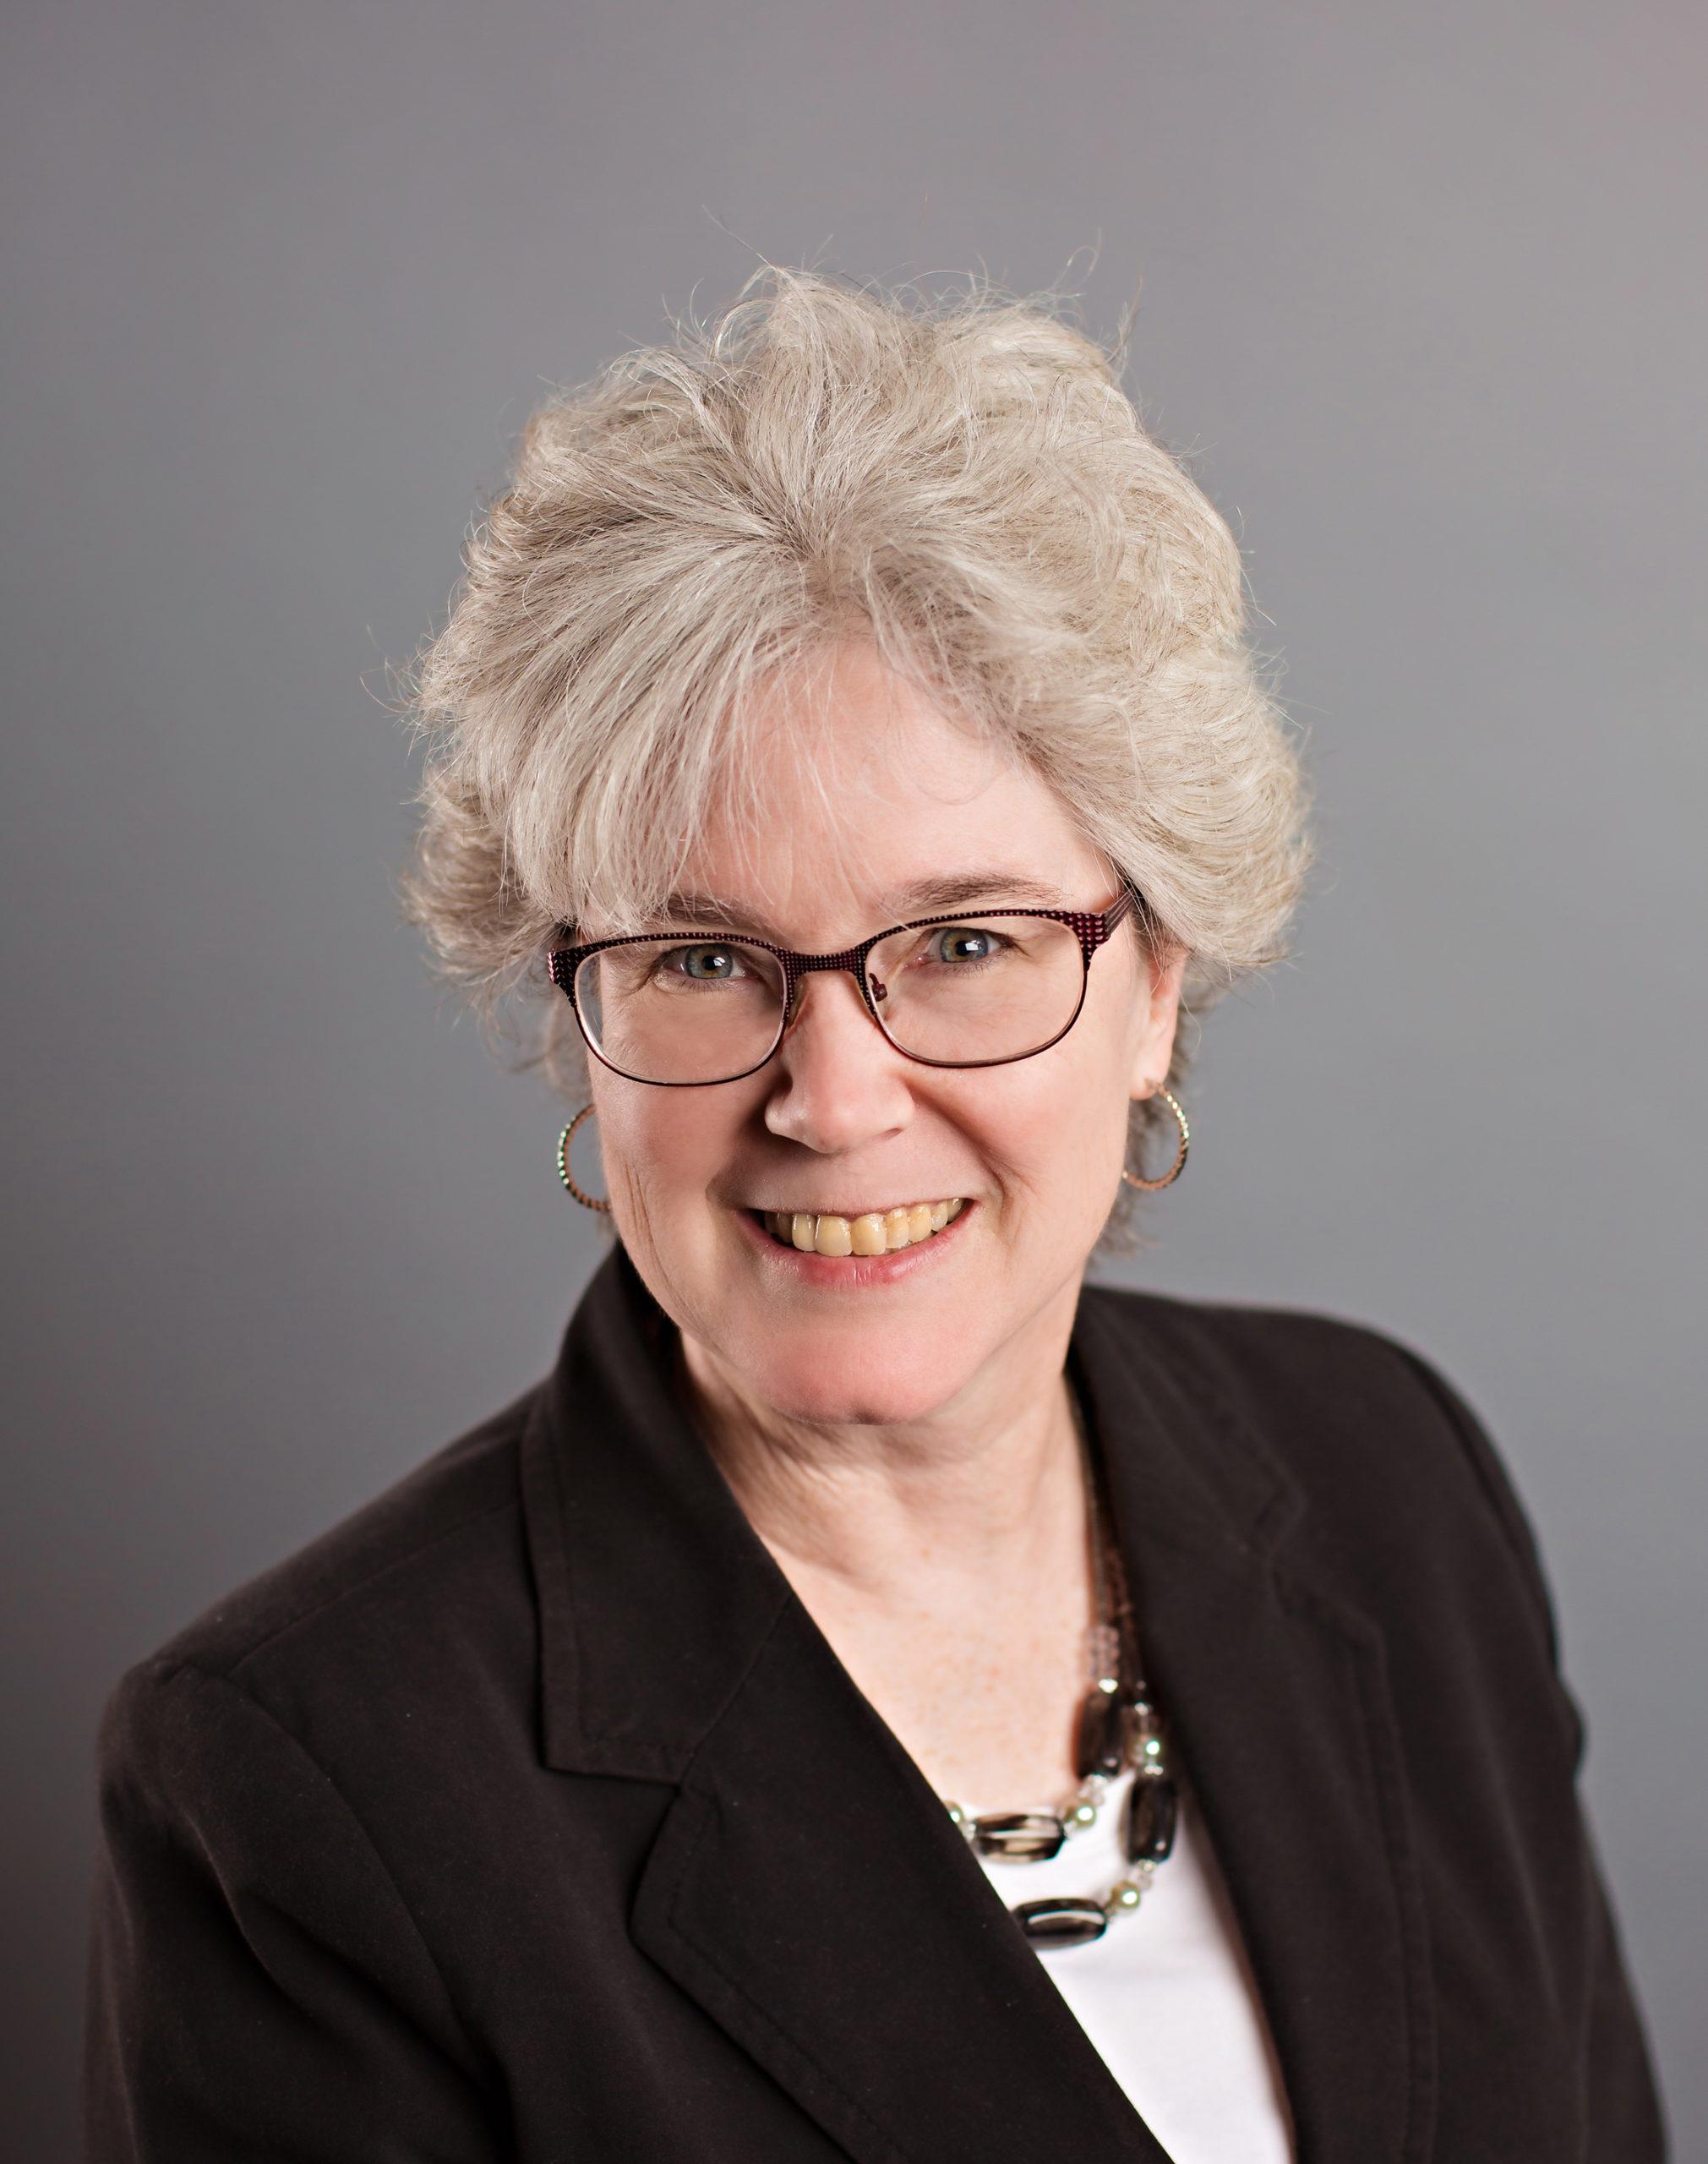 Janice Morey